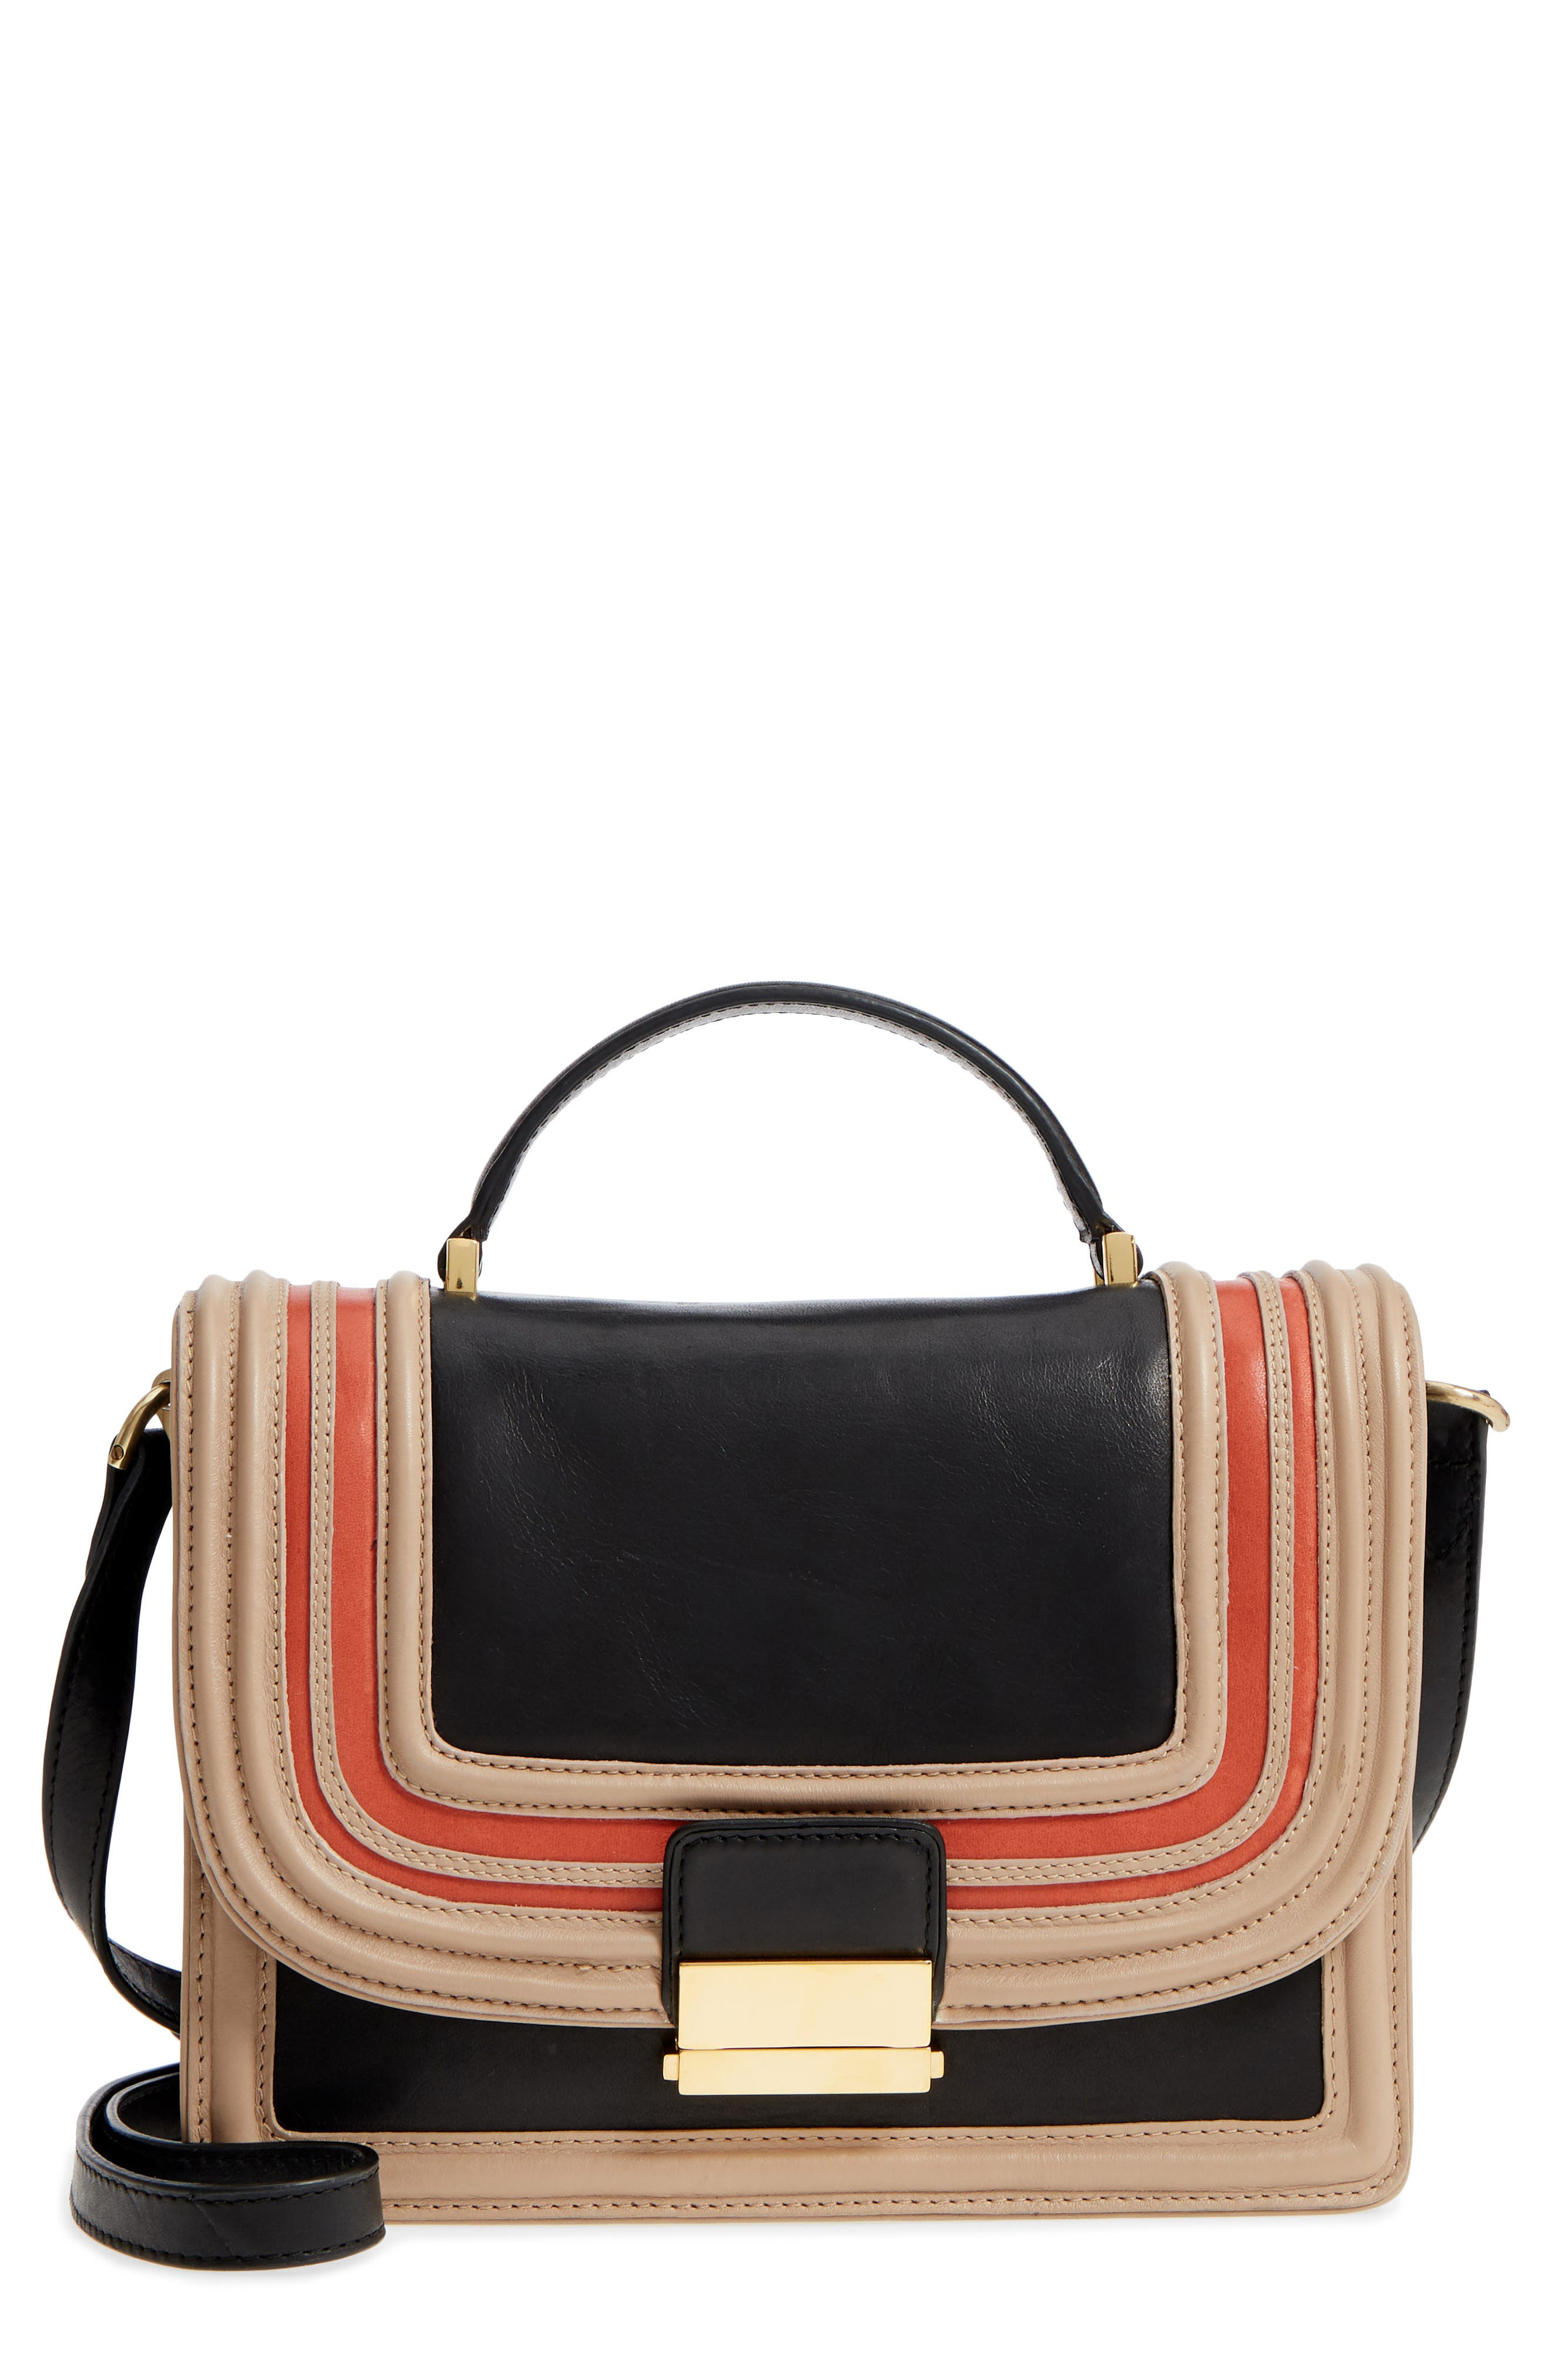 Small Square Top Handle Handbag,                         Main,                         color, Black